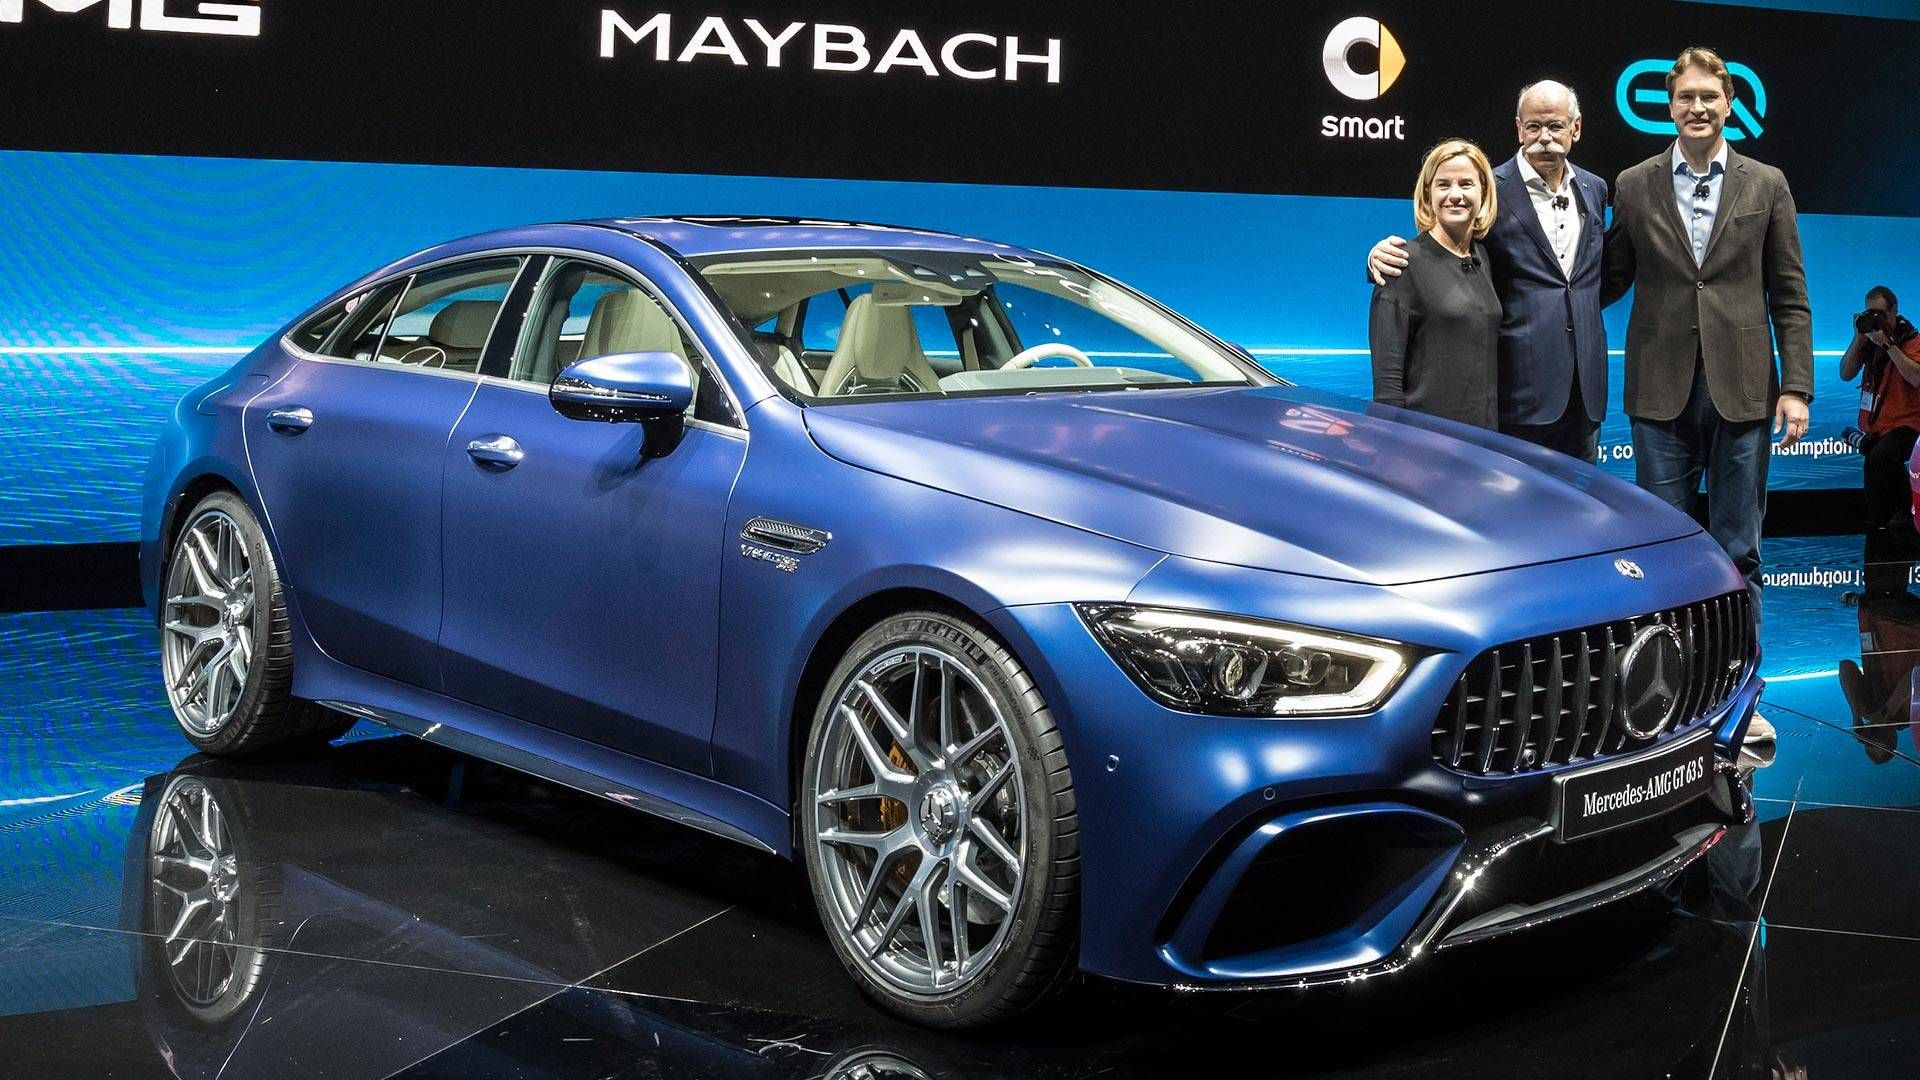 2019 Mercedes Amg Gt 4 Door Coupe Motor1 Com Photos Salon Geneve